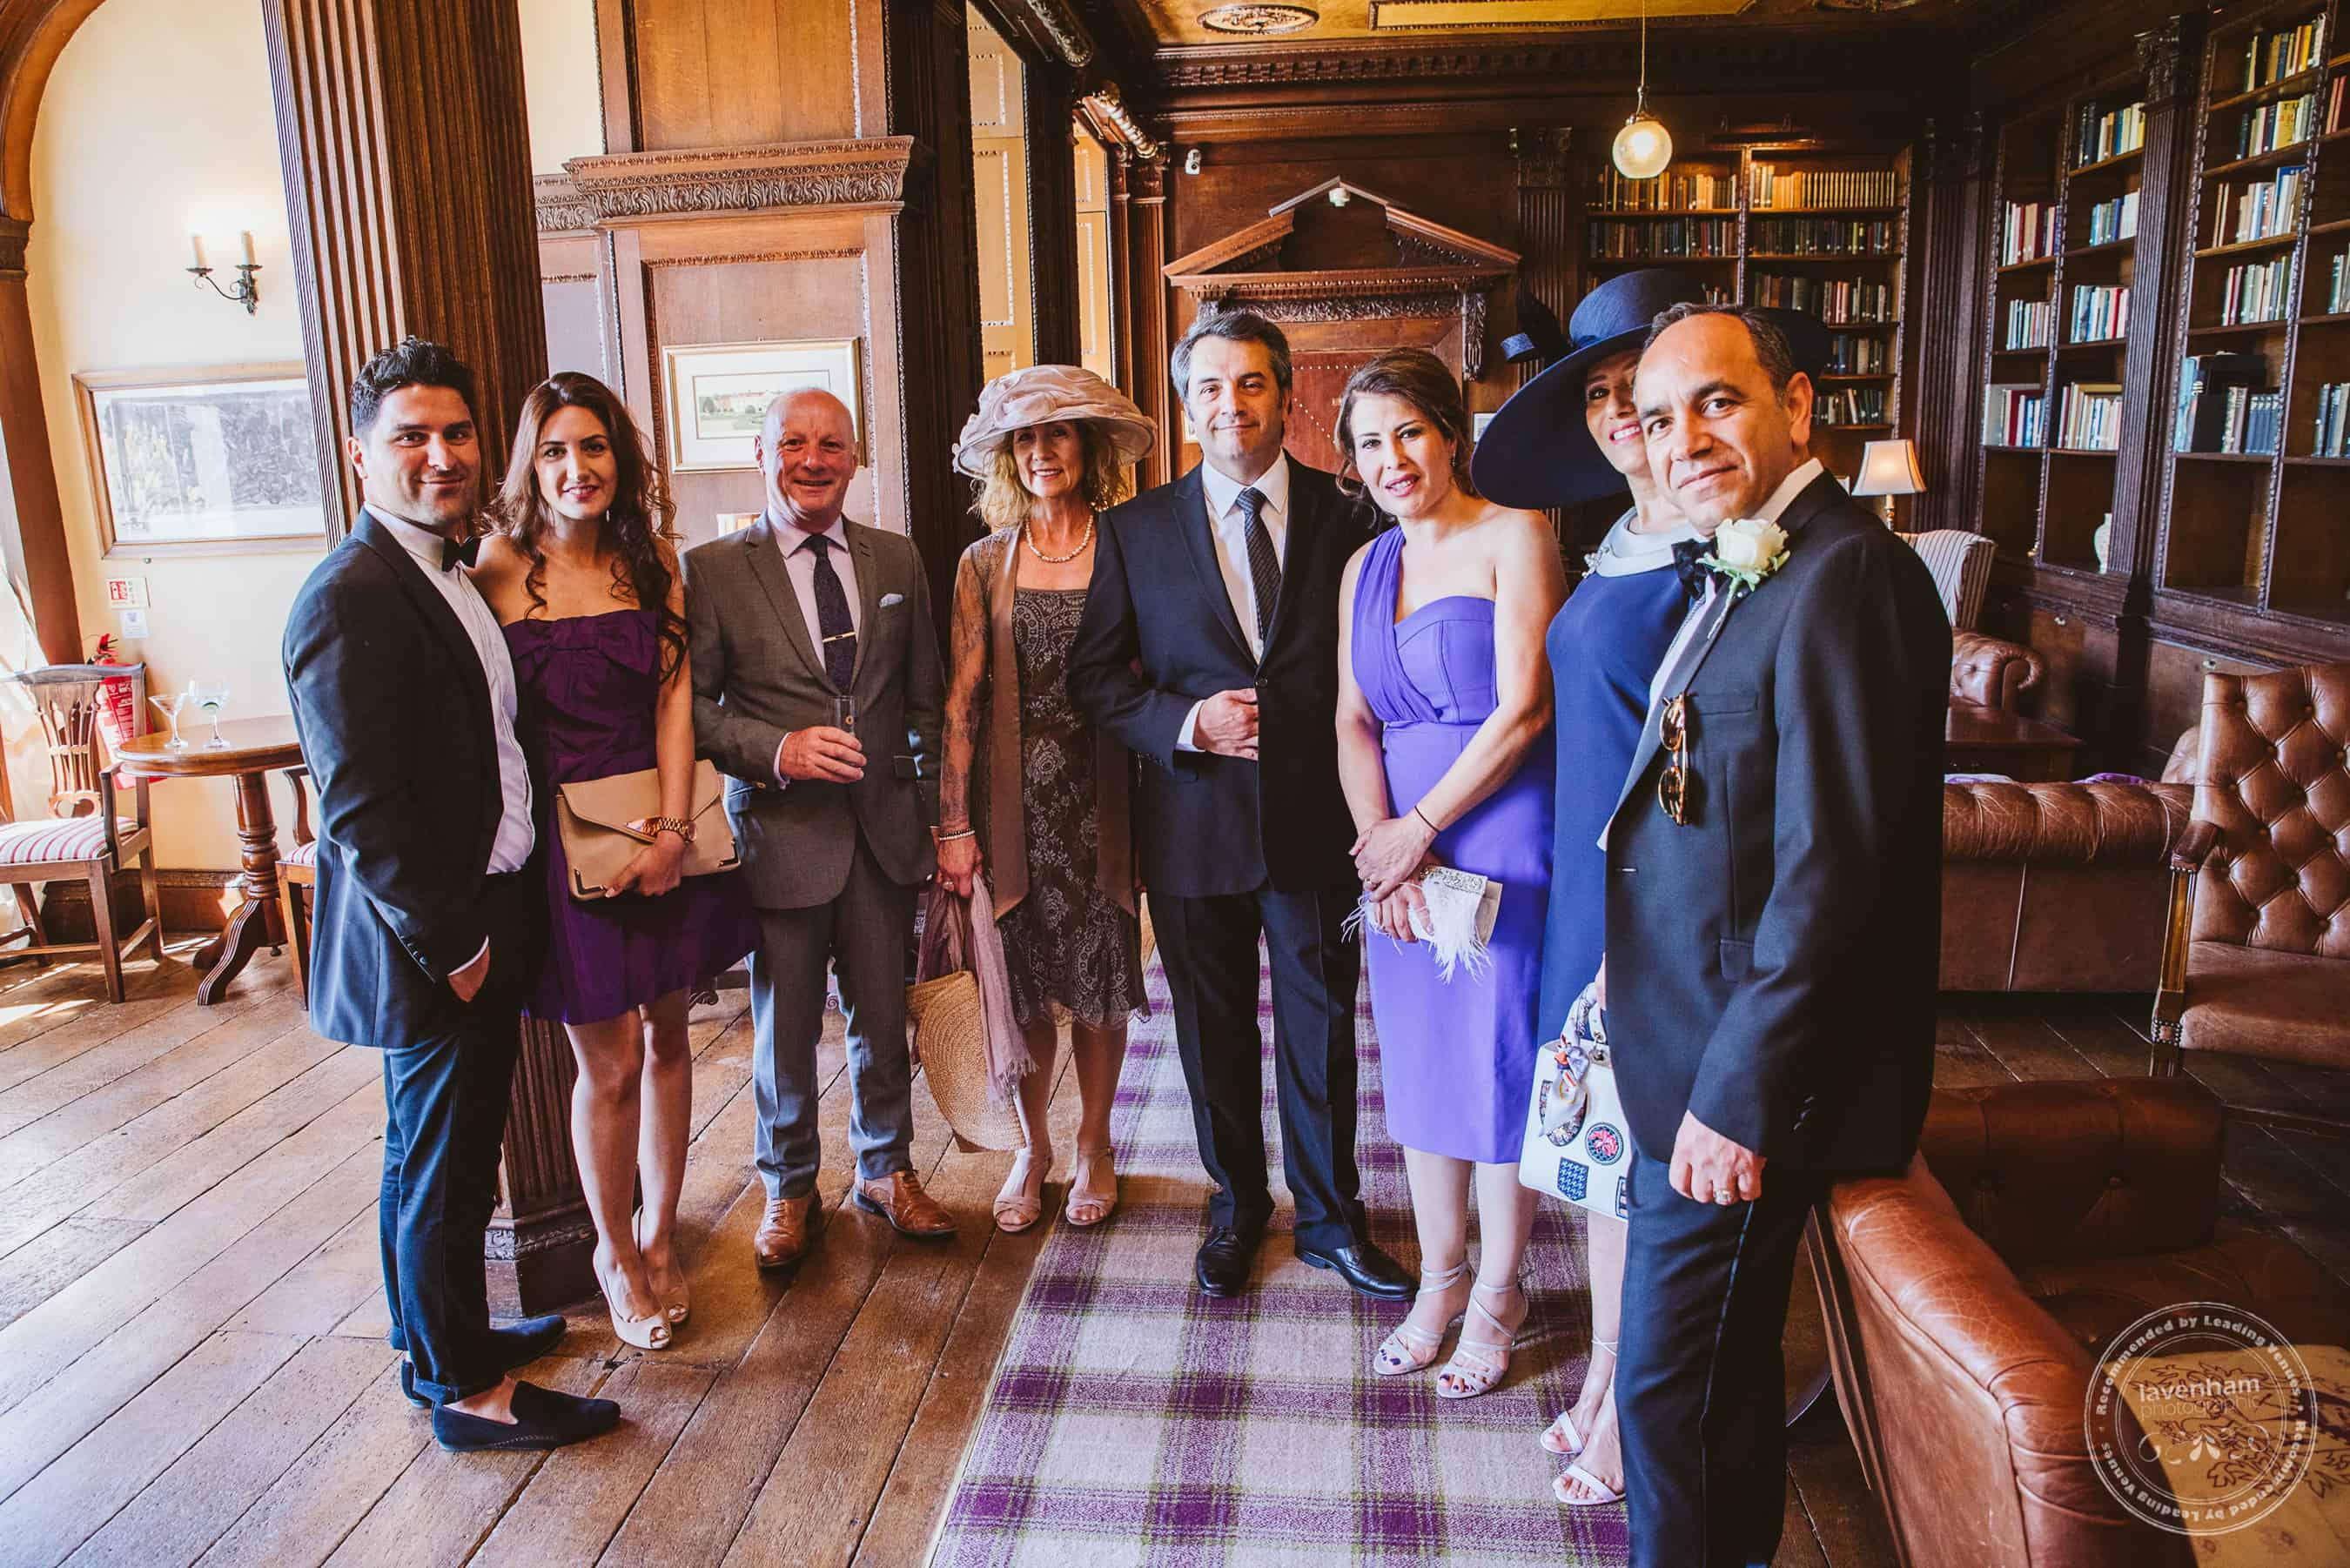 220618 Gosfield Hall Wedding Photography Lavenham Photographic 0054